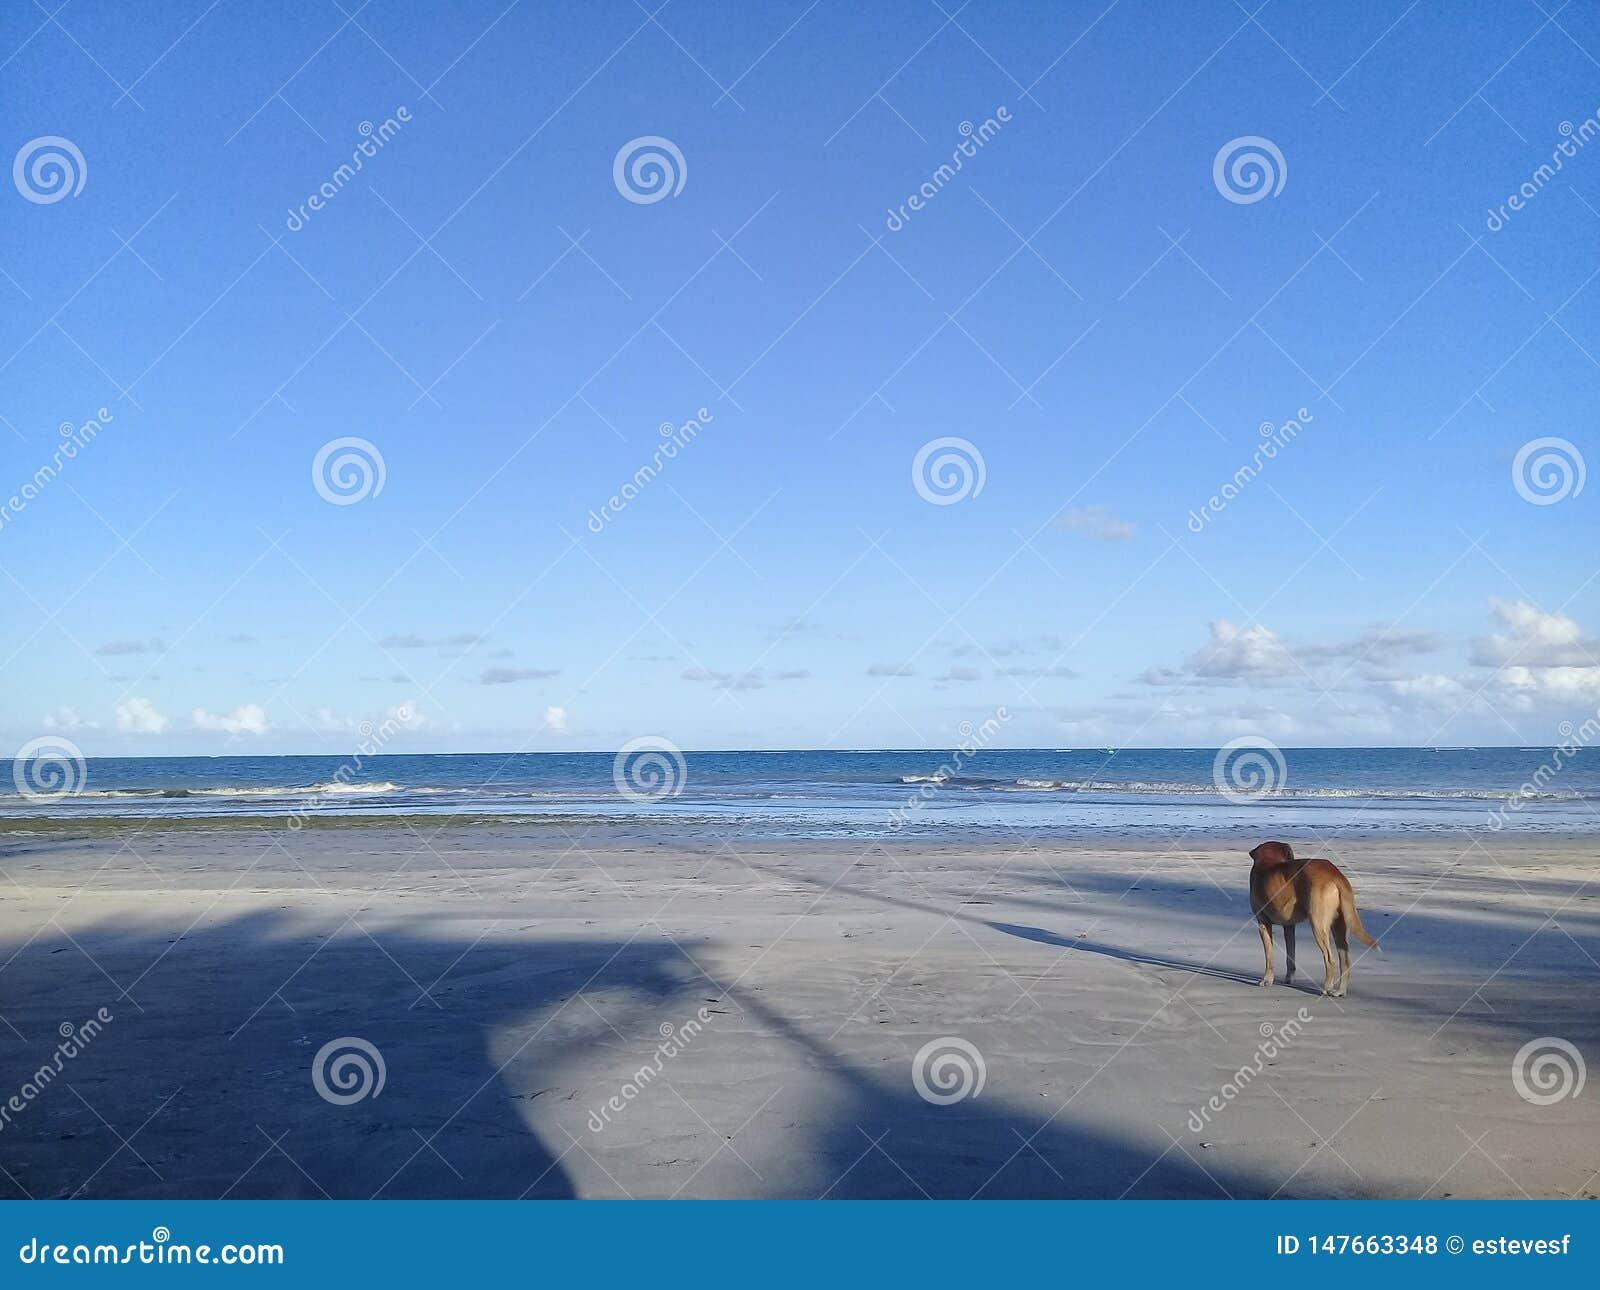 Alone dog on the beach